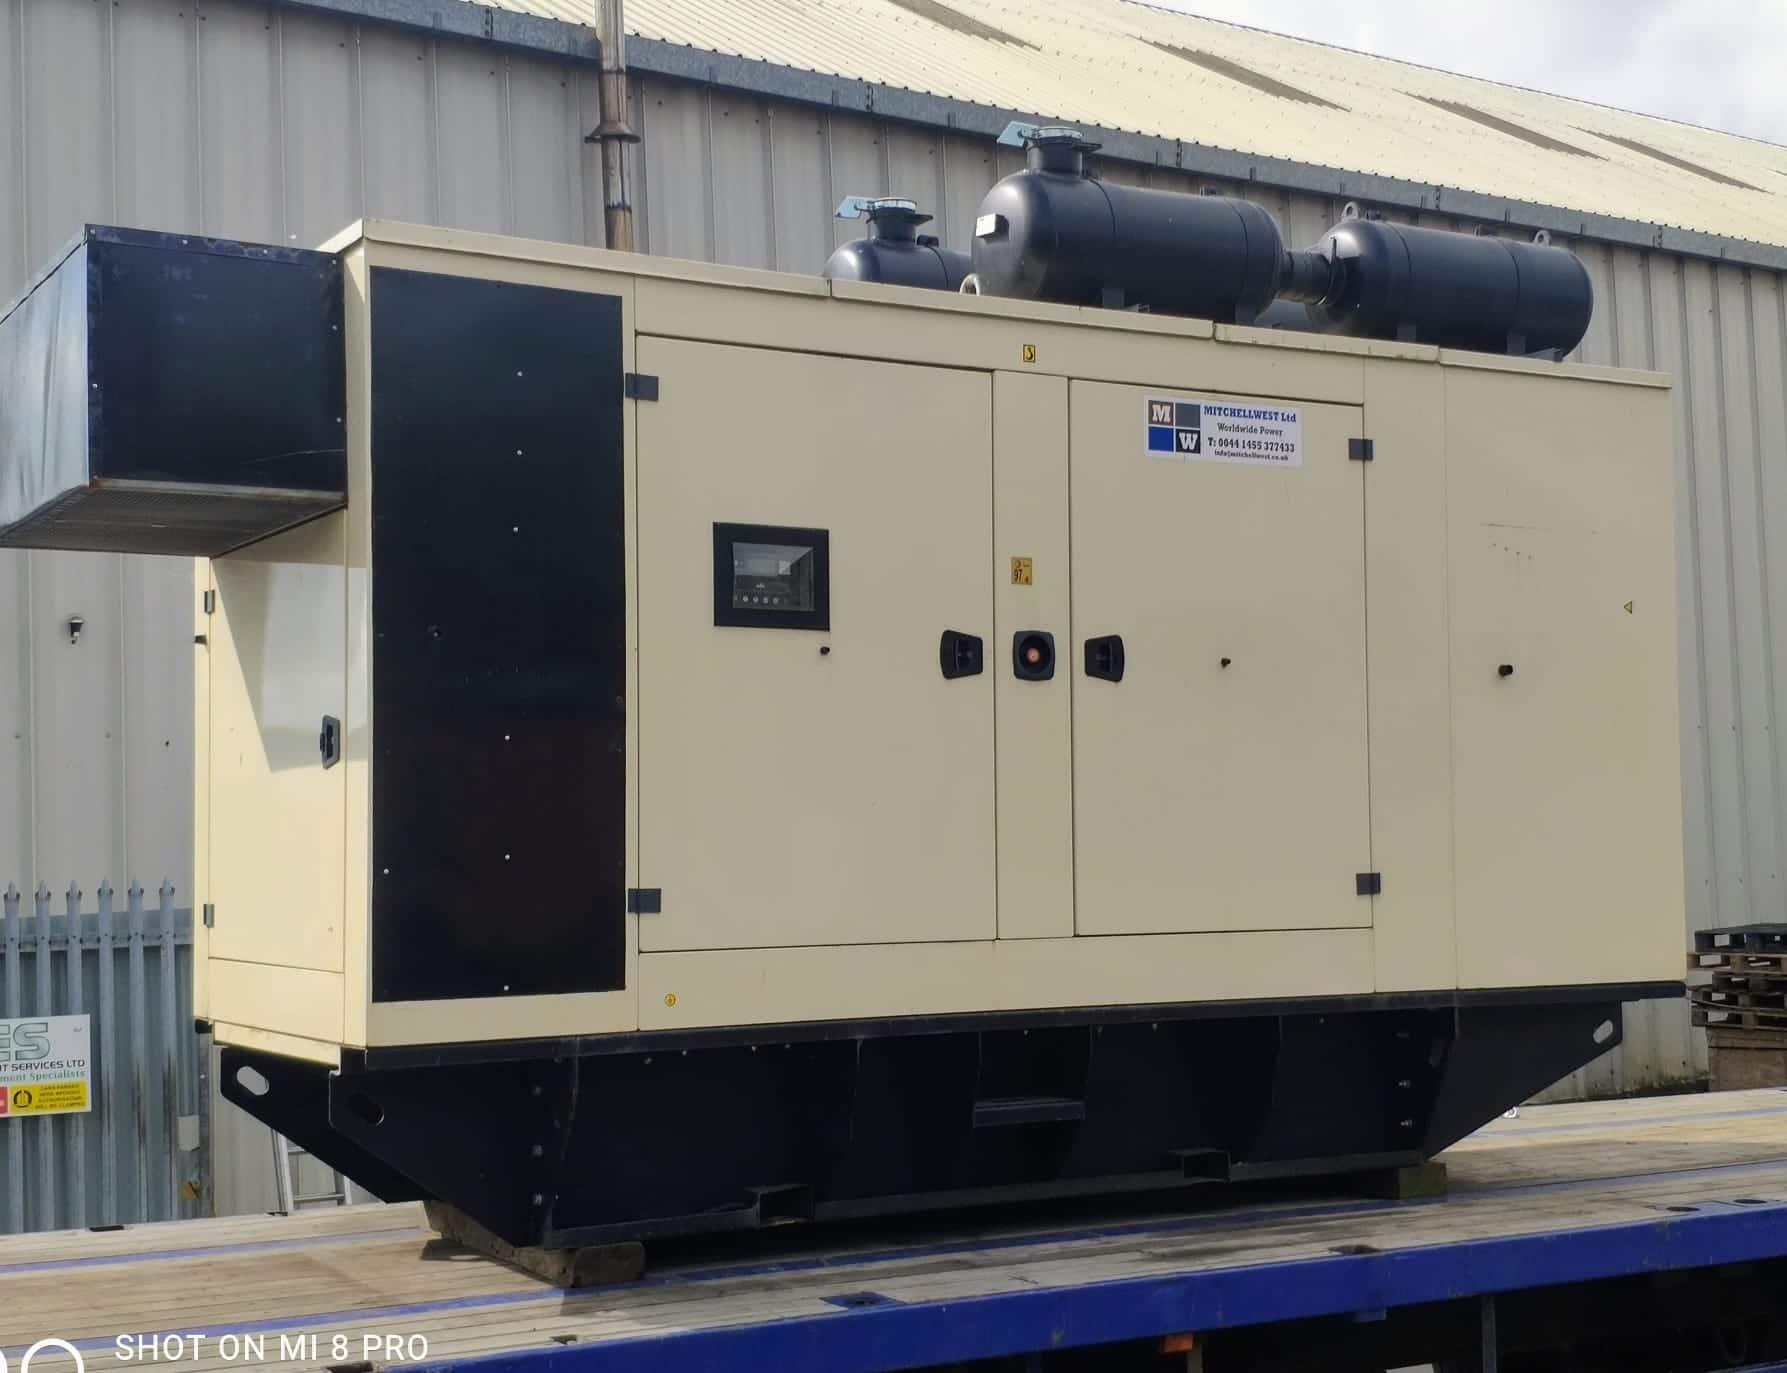 450 Kva Doosan/MeccAlte Acoustic Generator for sale